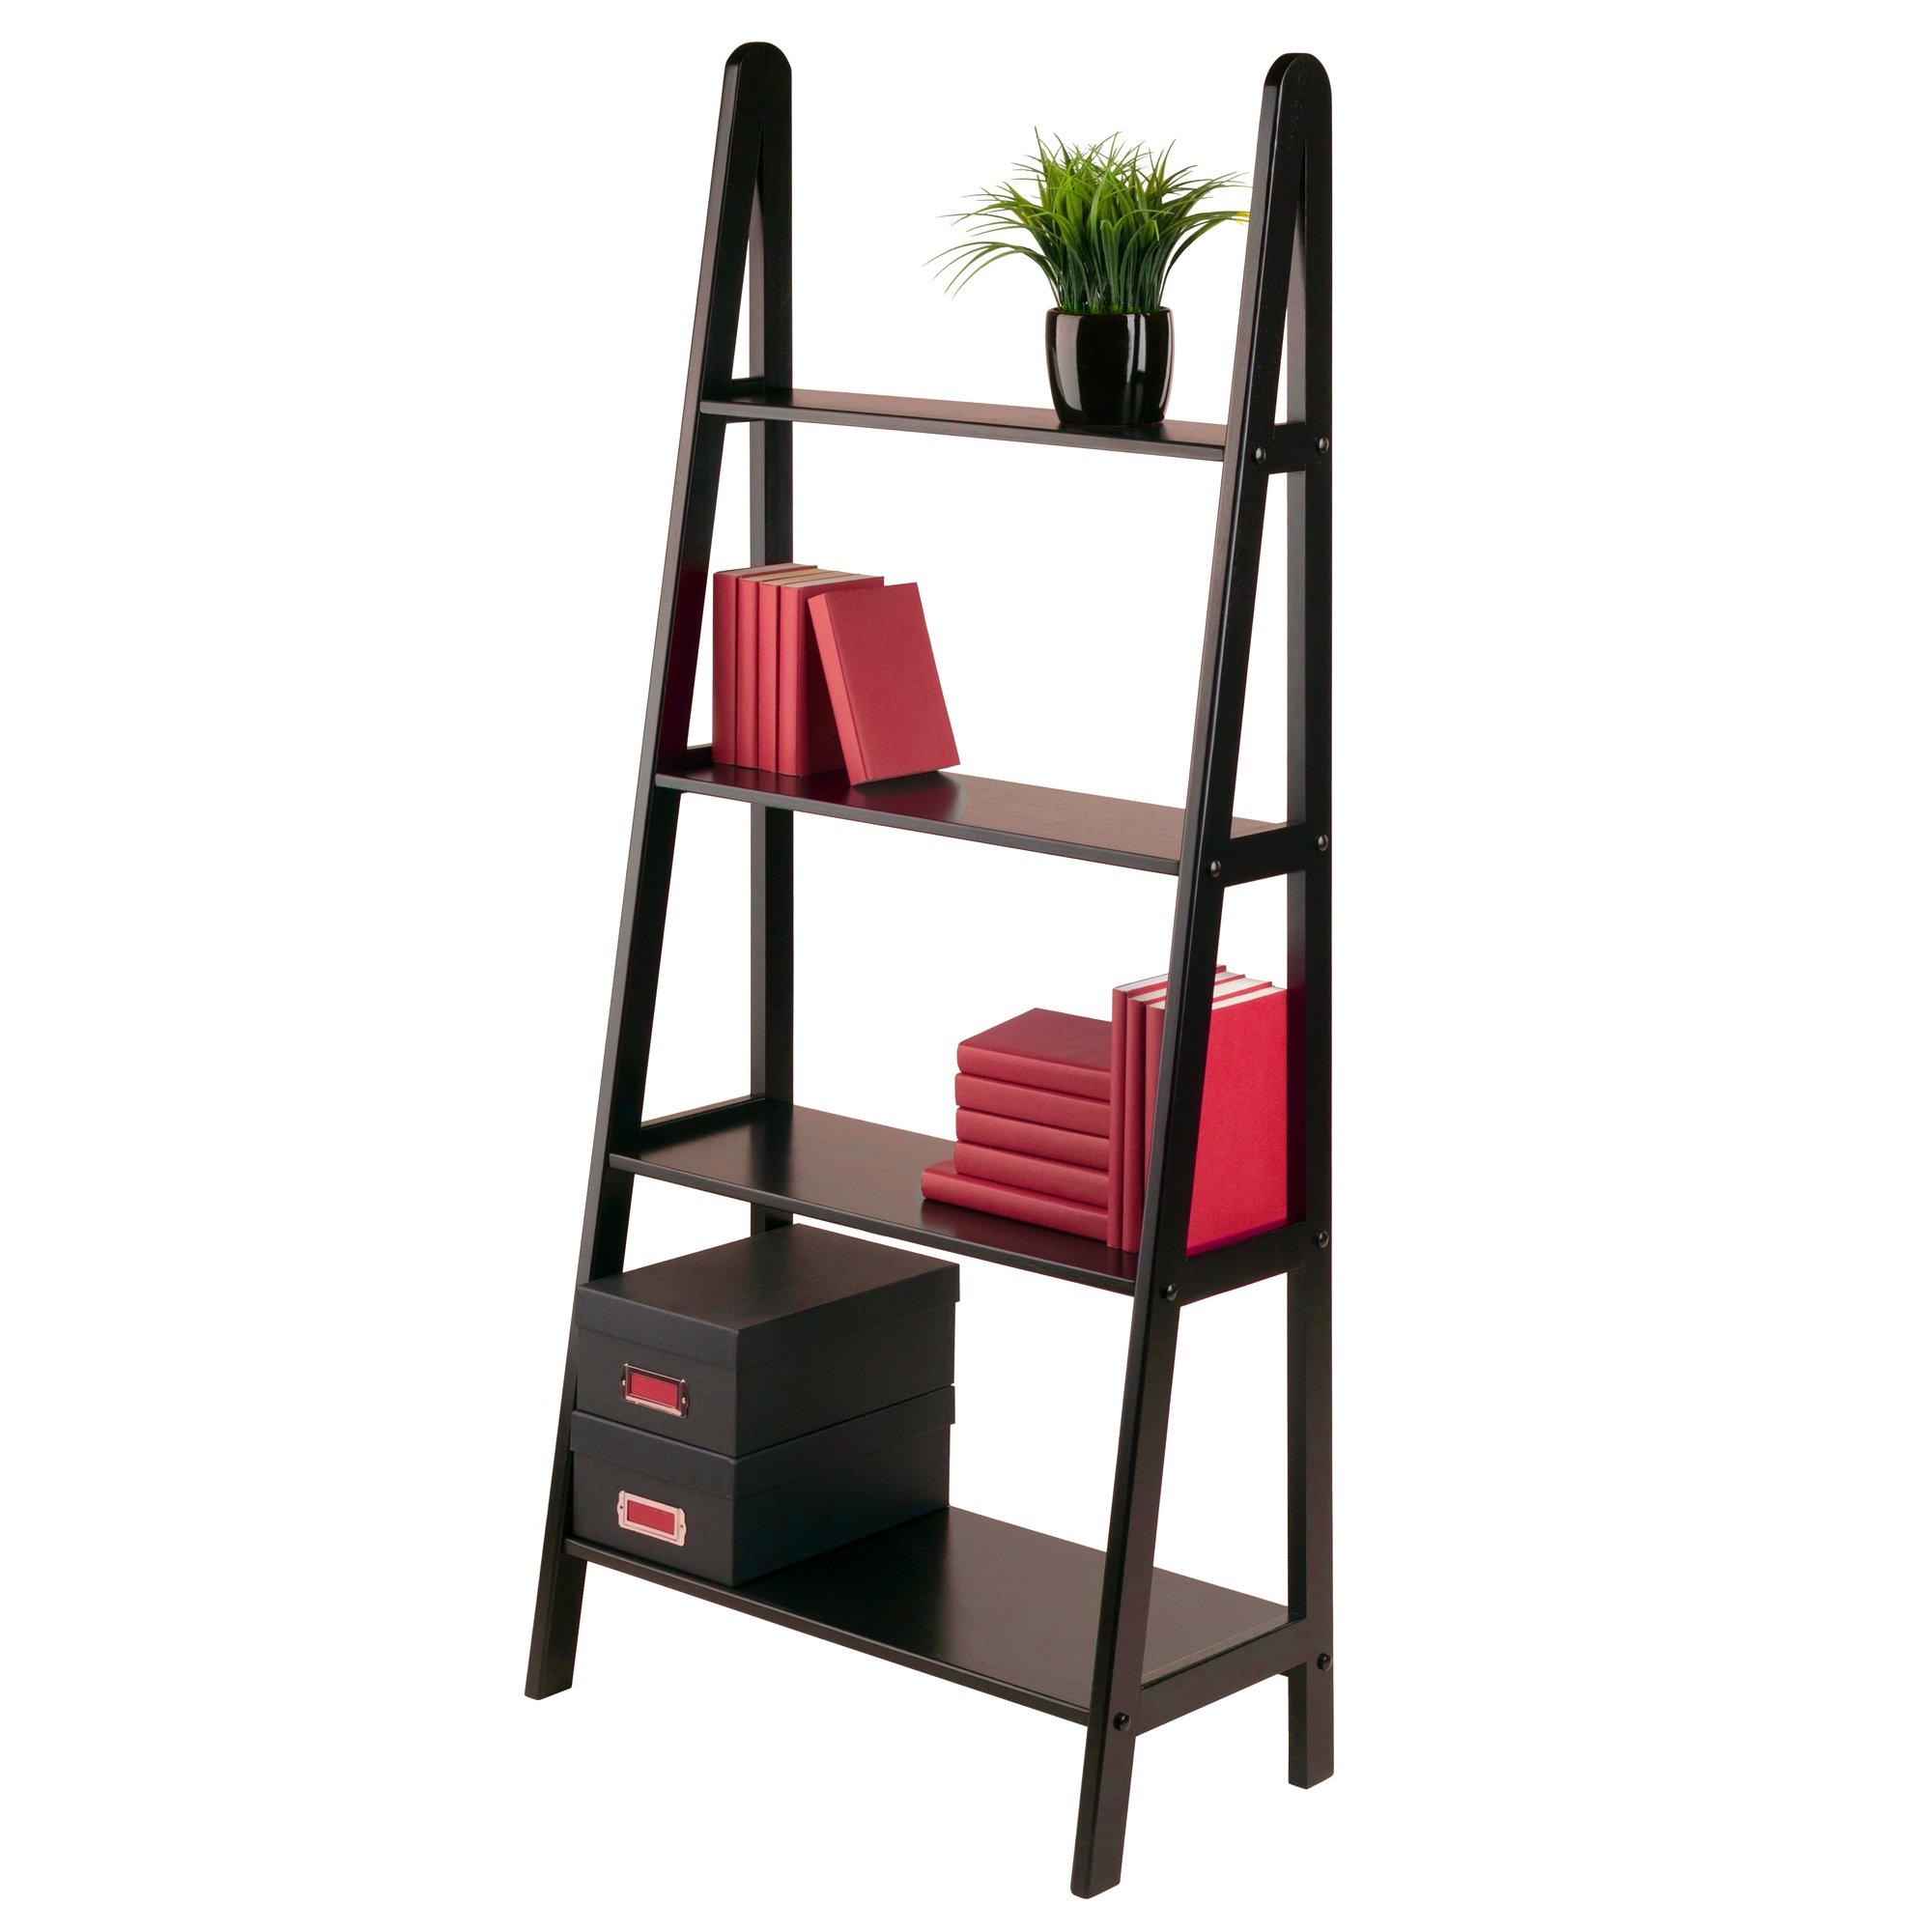 Winsome Wood 4-Tier A-Frame Shelf, Dark Espresso by Winsome Wood (Image #7)